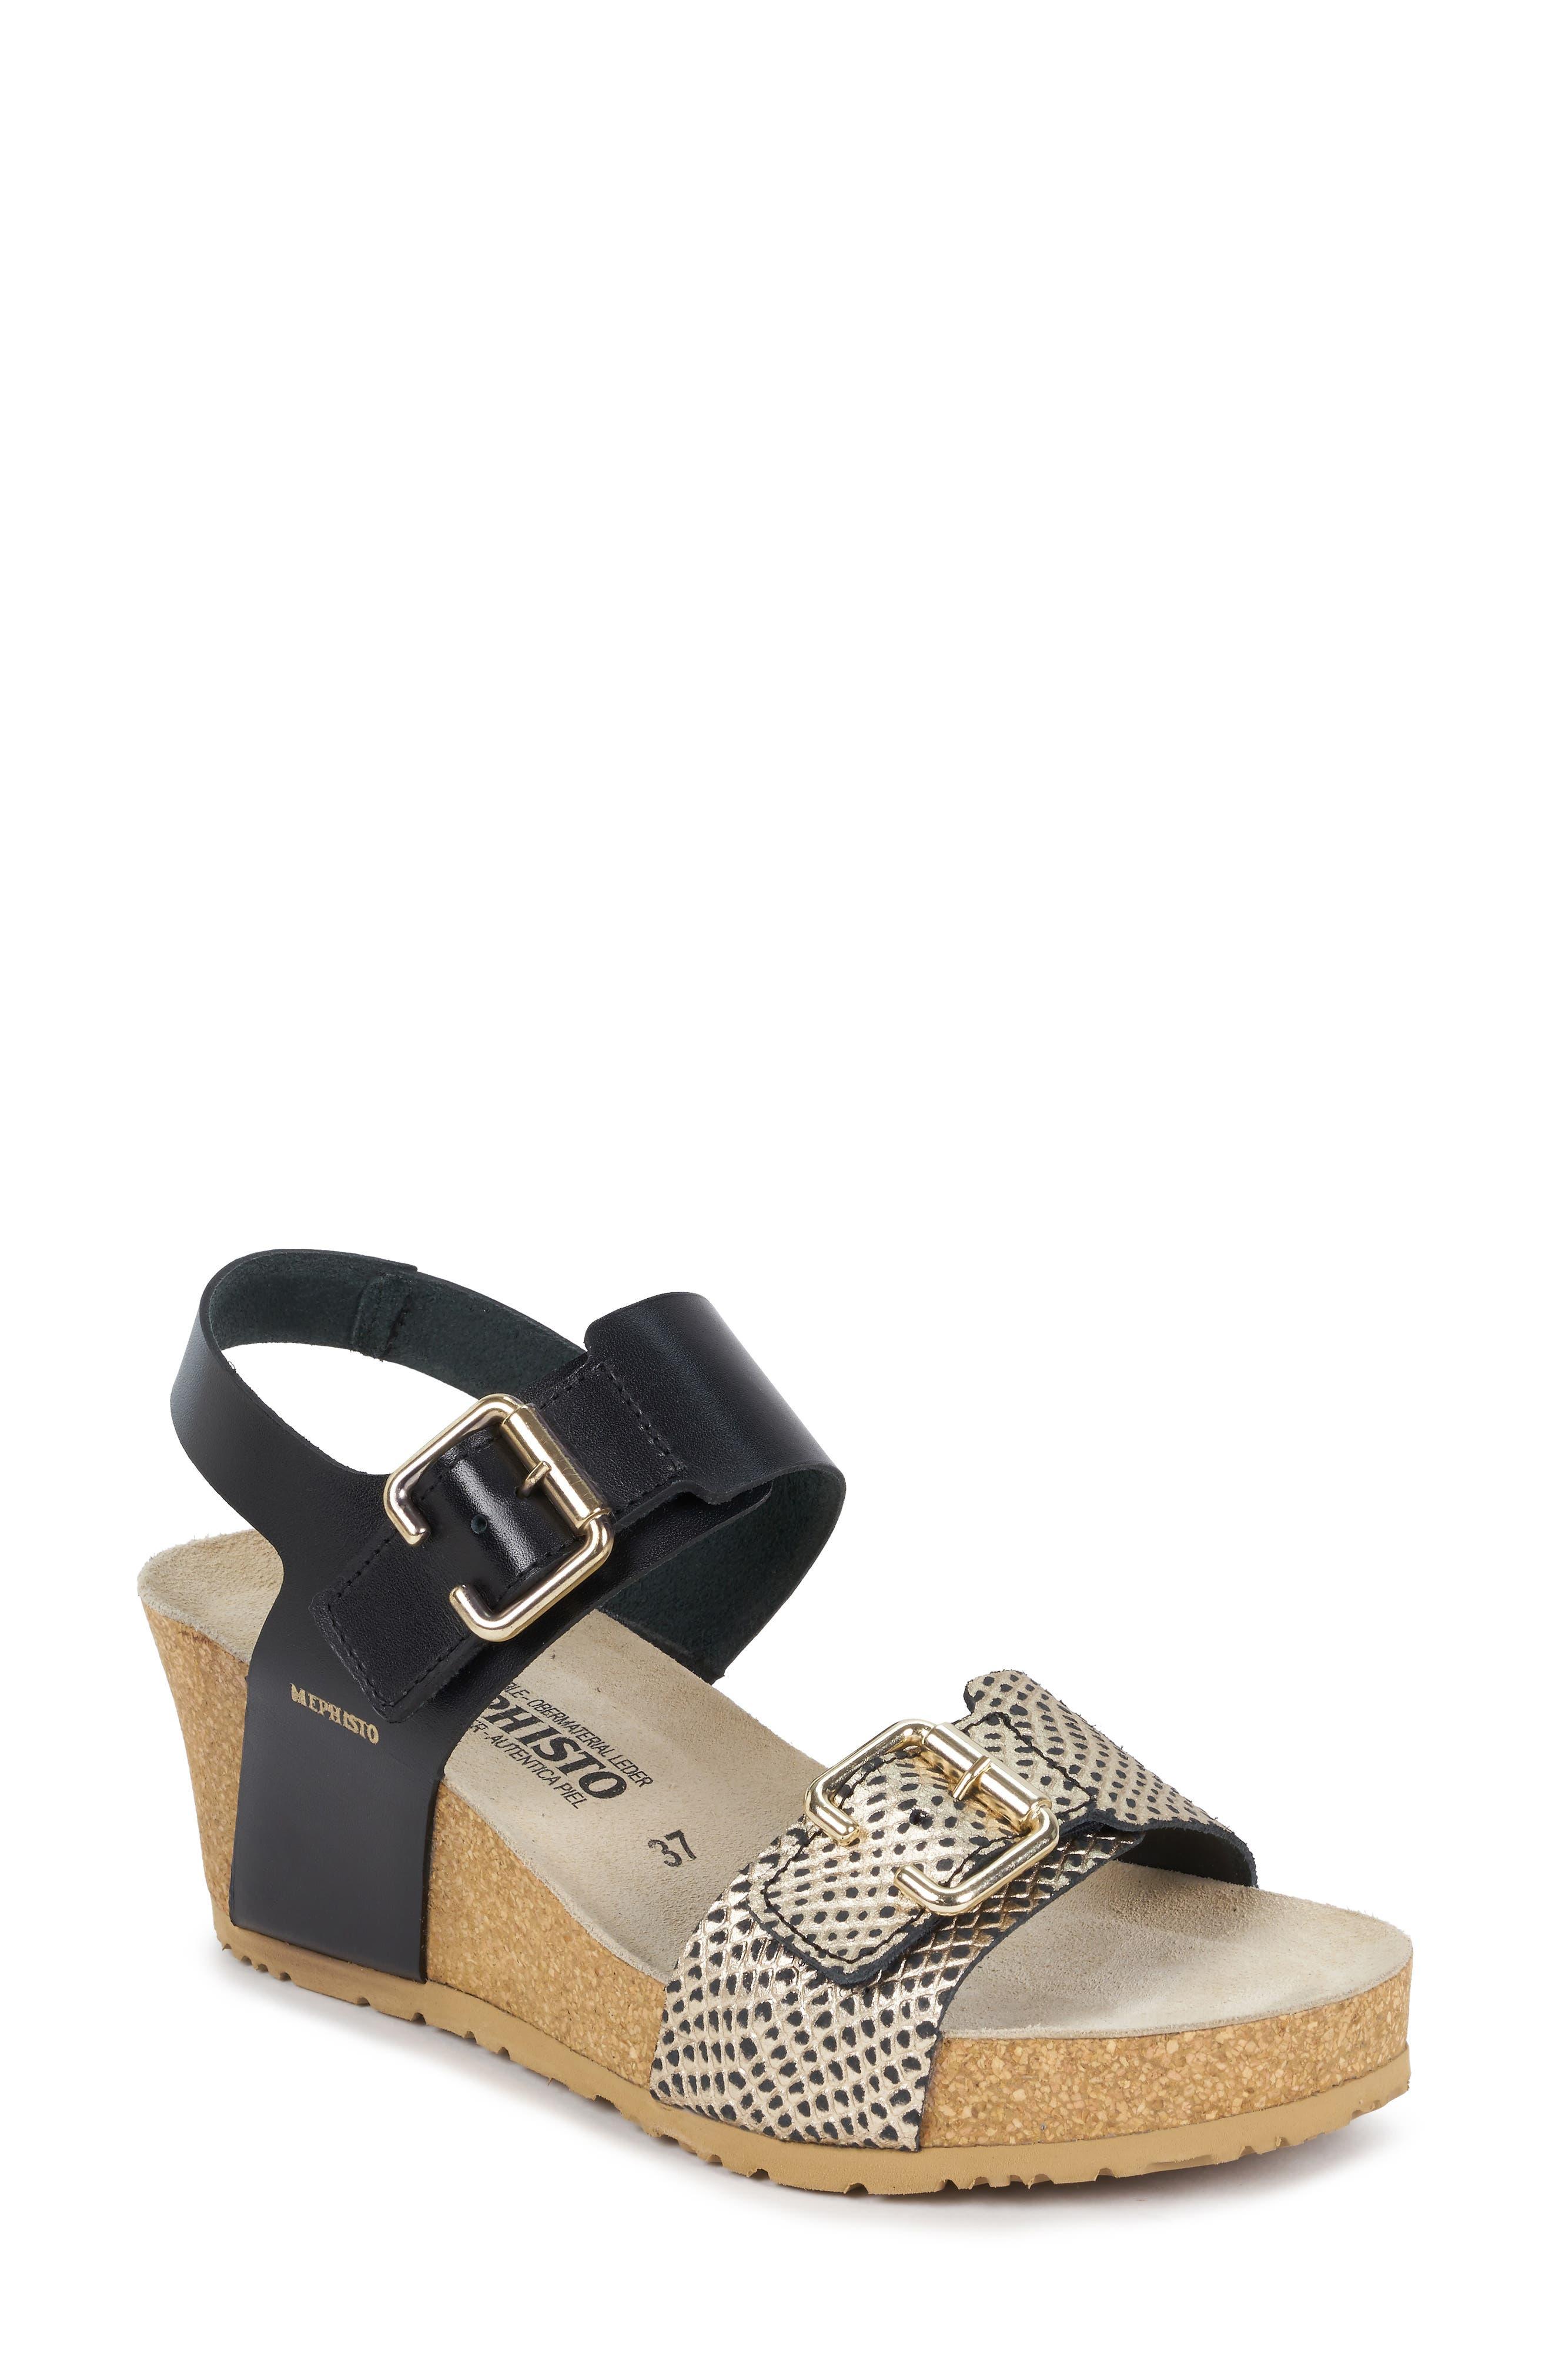 MEPHISTO Lissandra Platform Wedge Sandal, Main, color, BLACK/ GOLD LEATHER